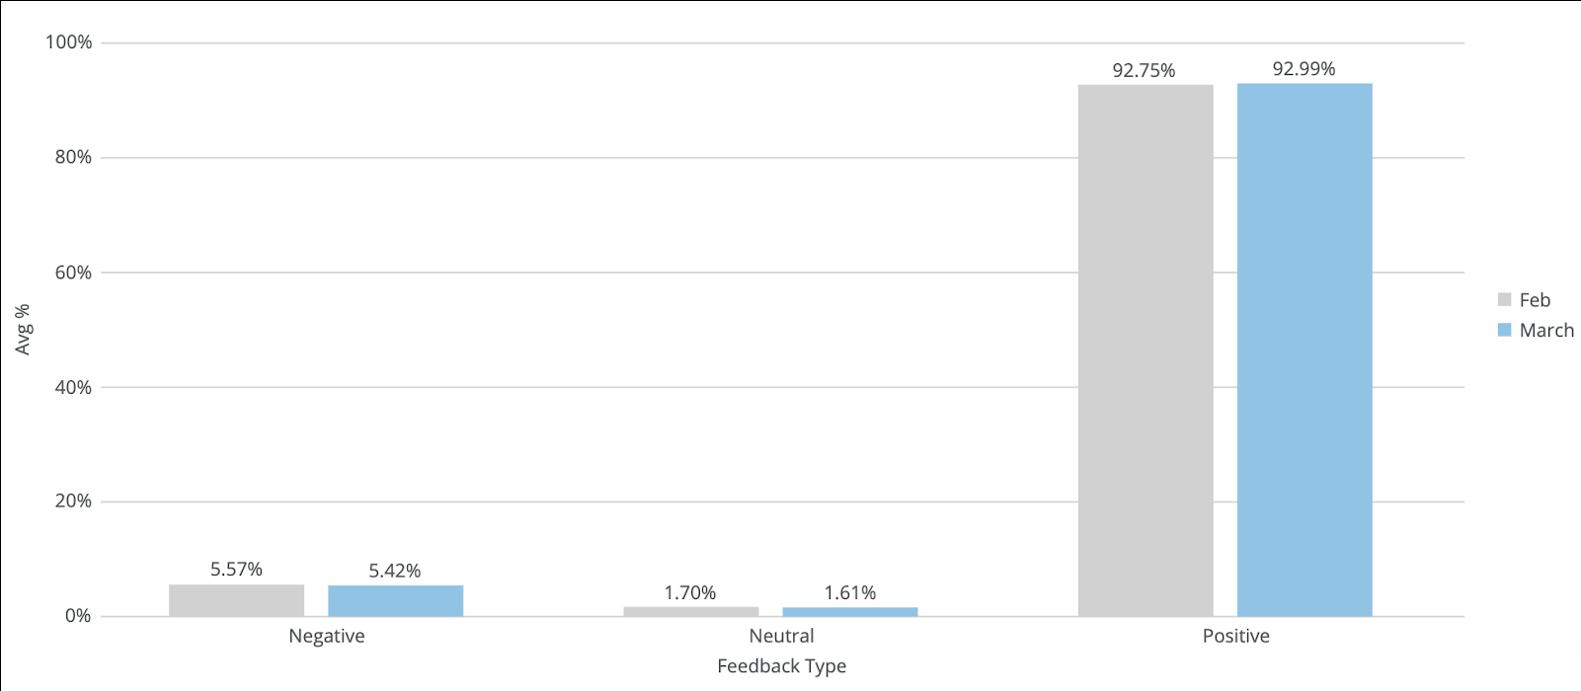 percentage of positive amazon feedback scores versus negative feedback during coronavirus